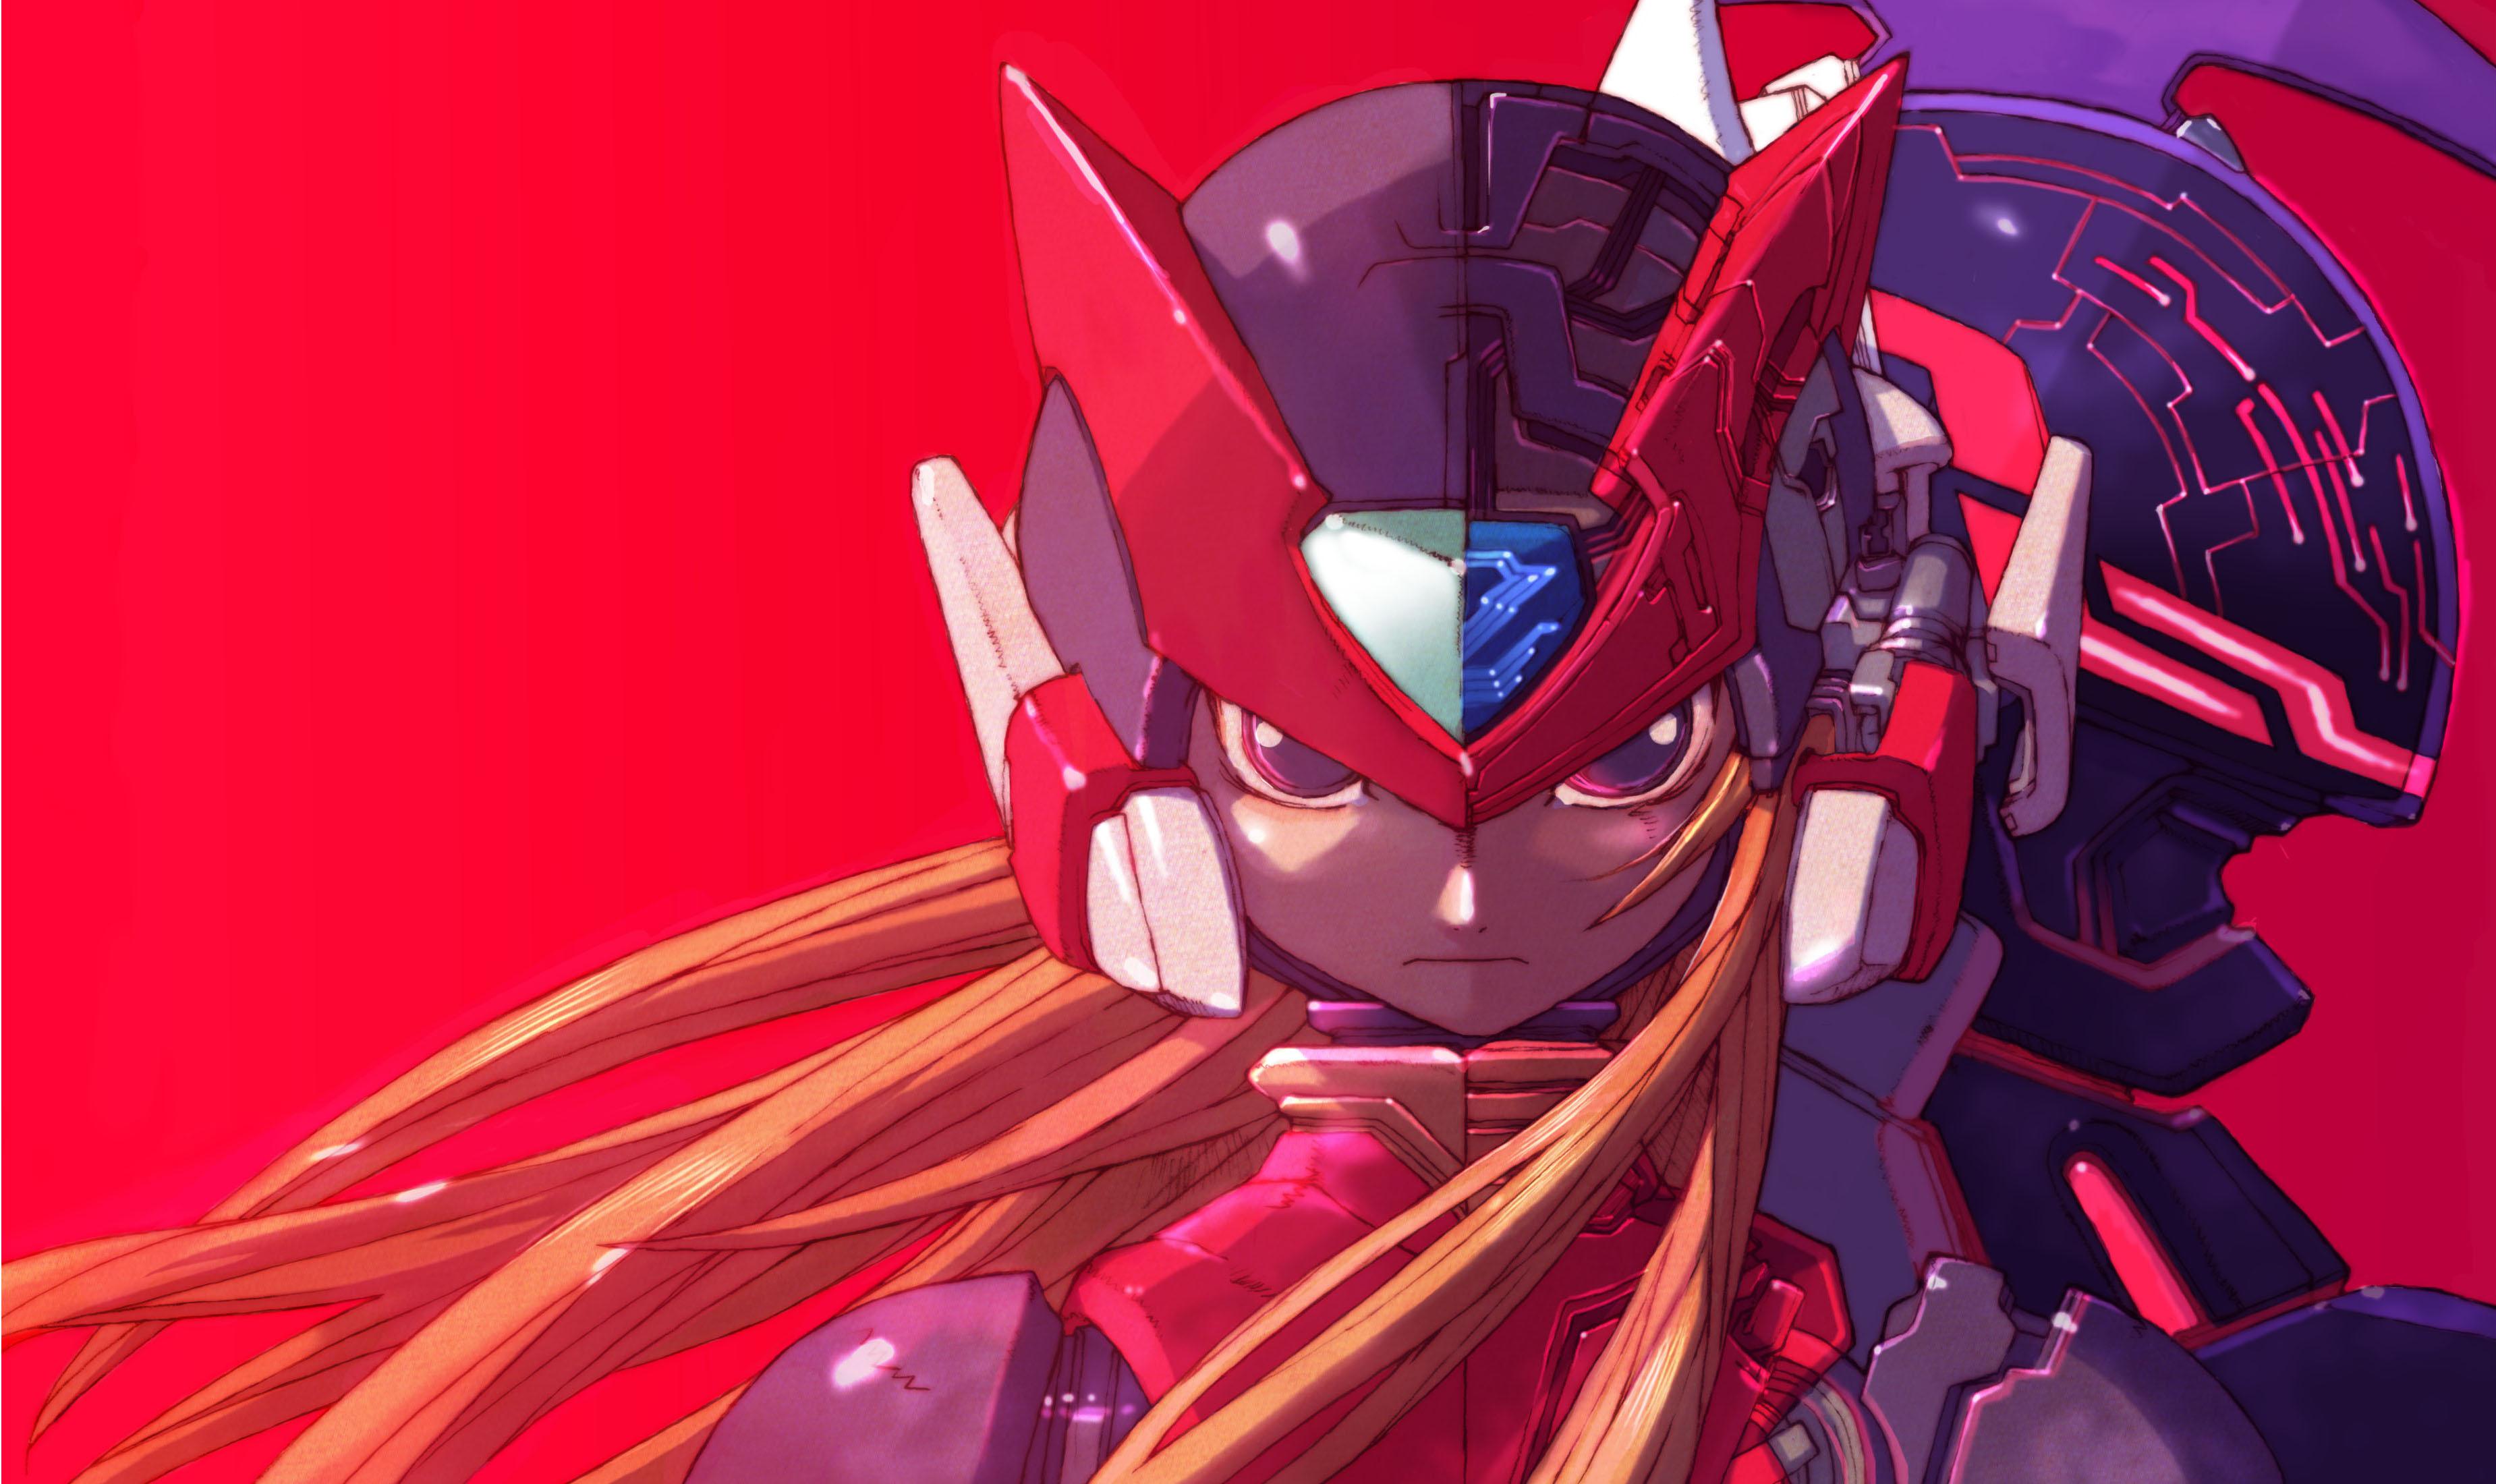 Download 1080P Megaman Wallpaper Background